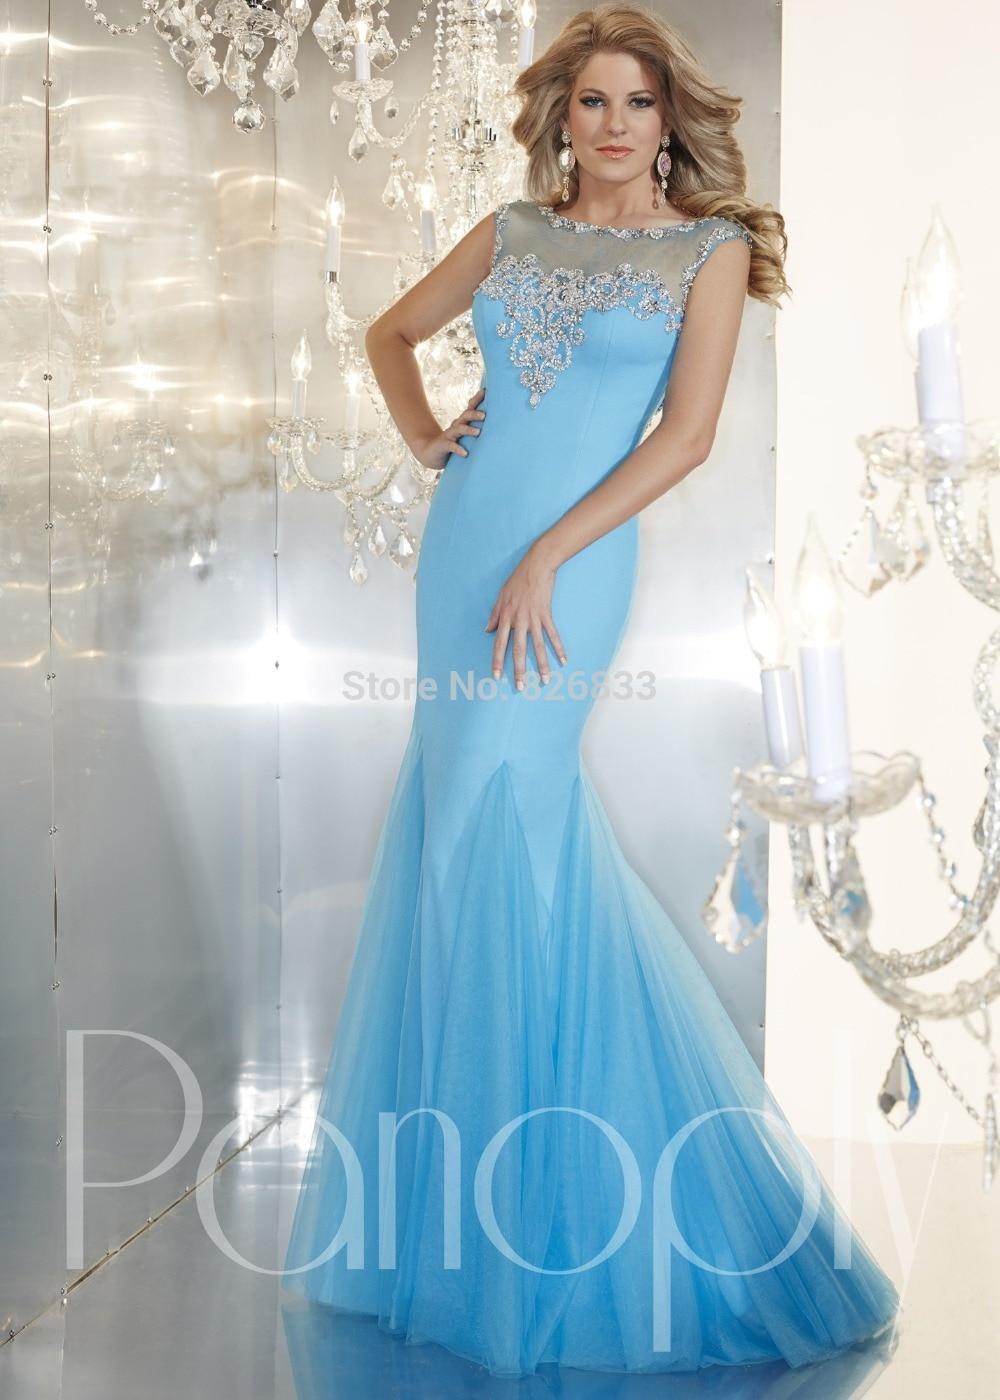 Fantastic Prom Dresses In Portland Oregon Pictures - All Wedding ...